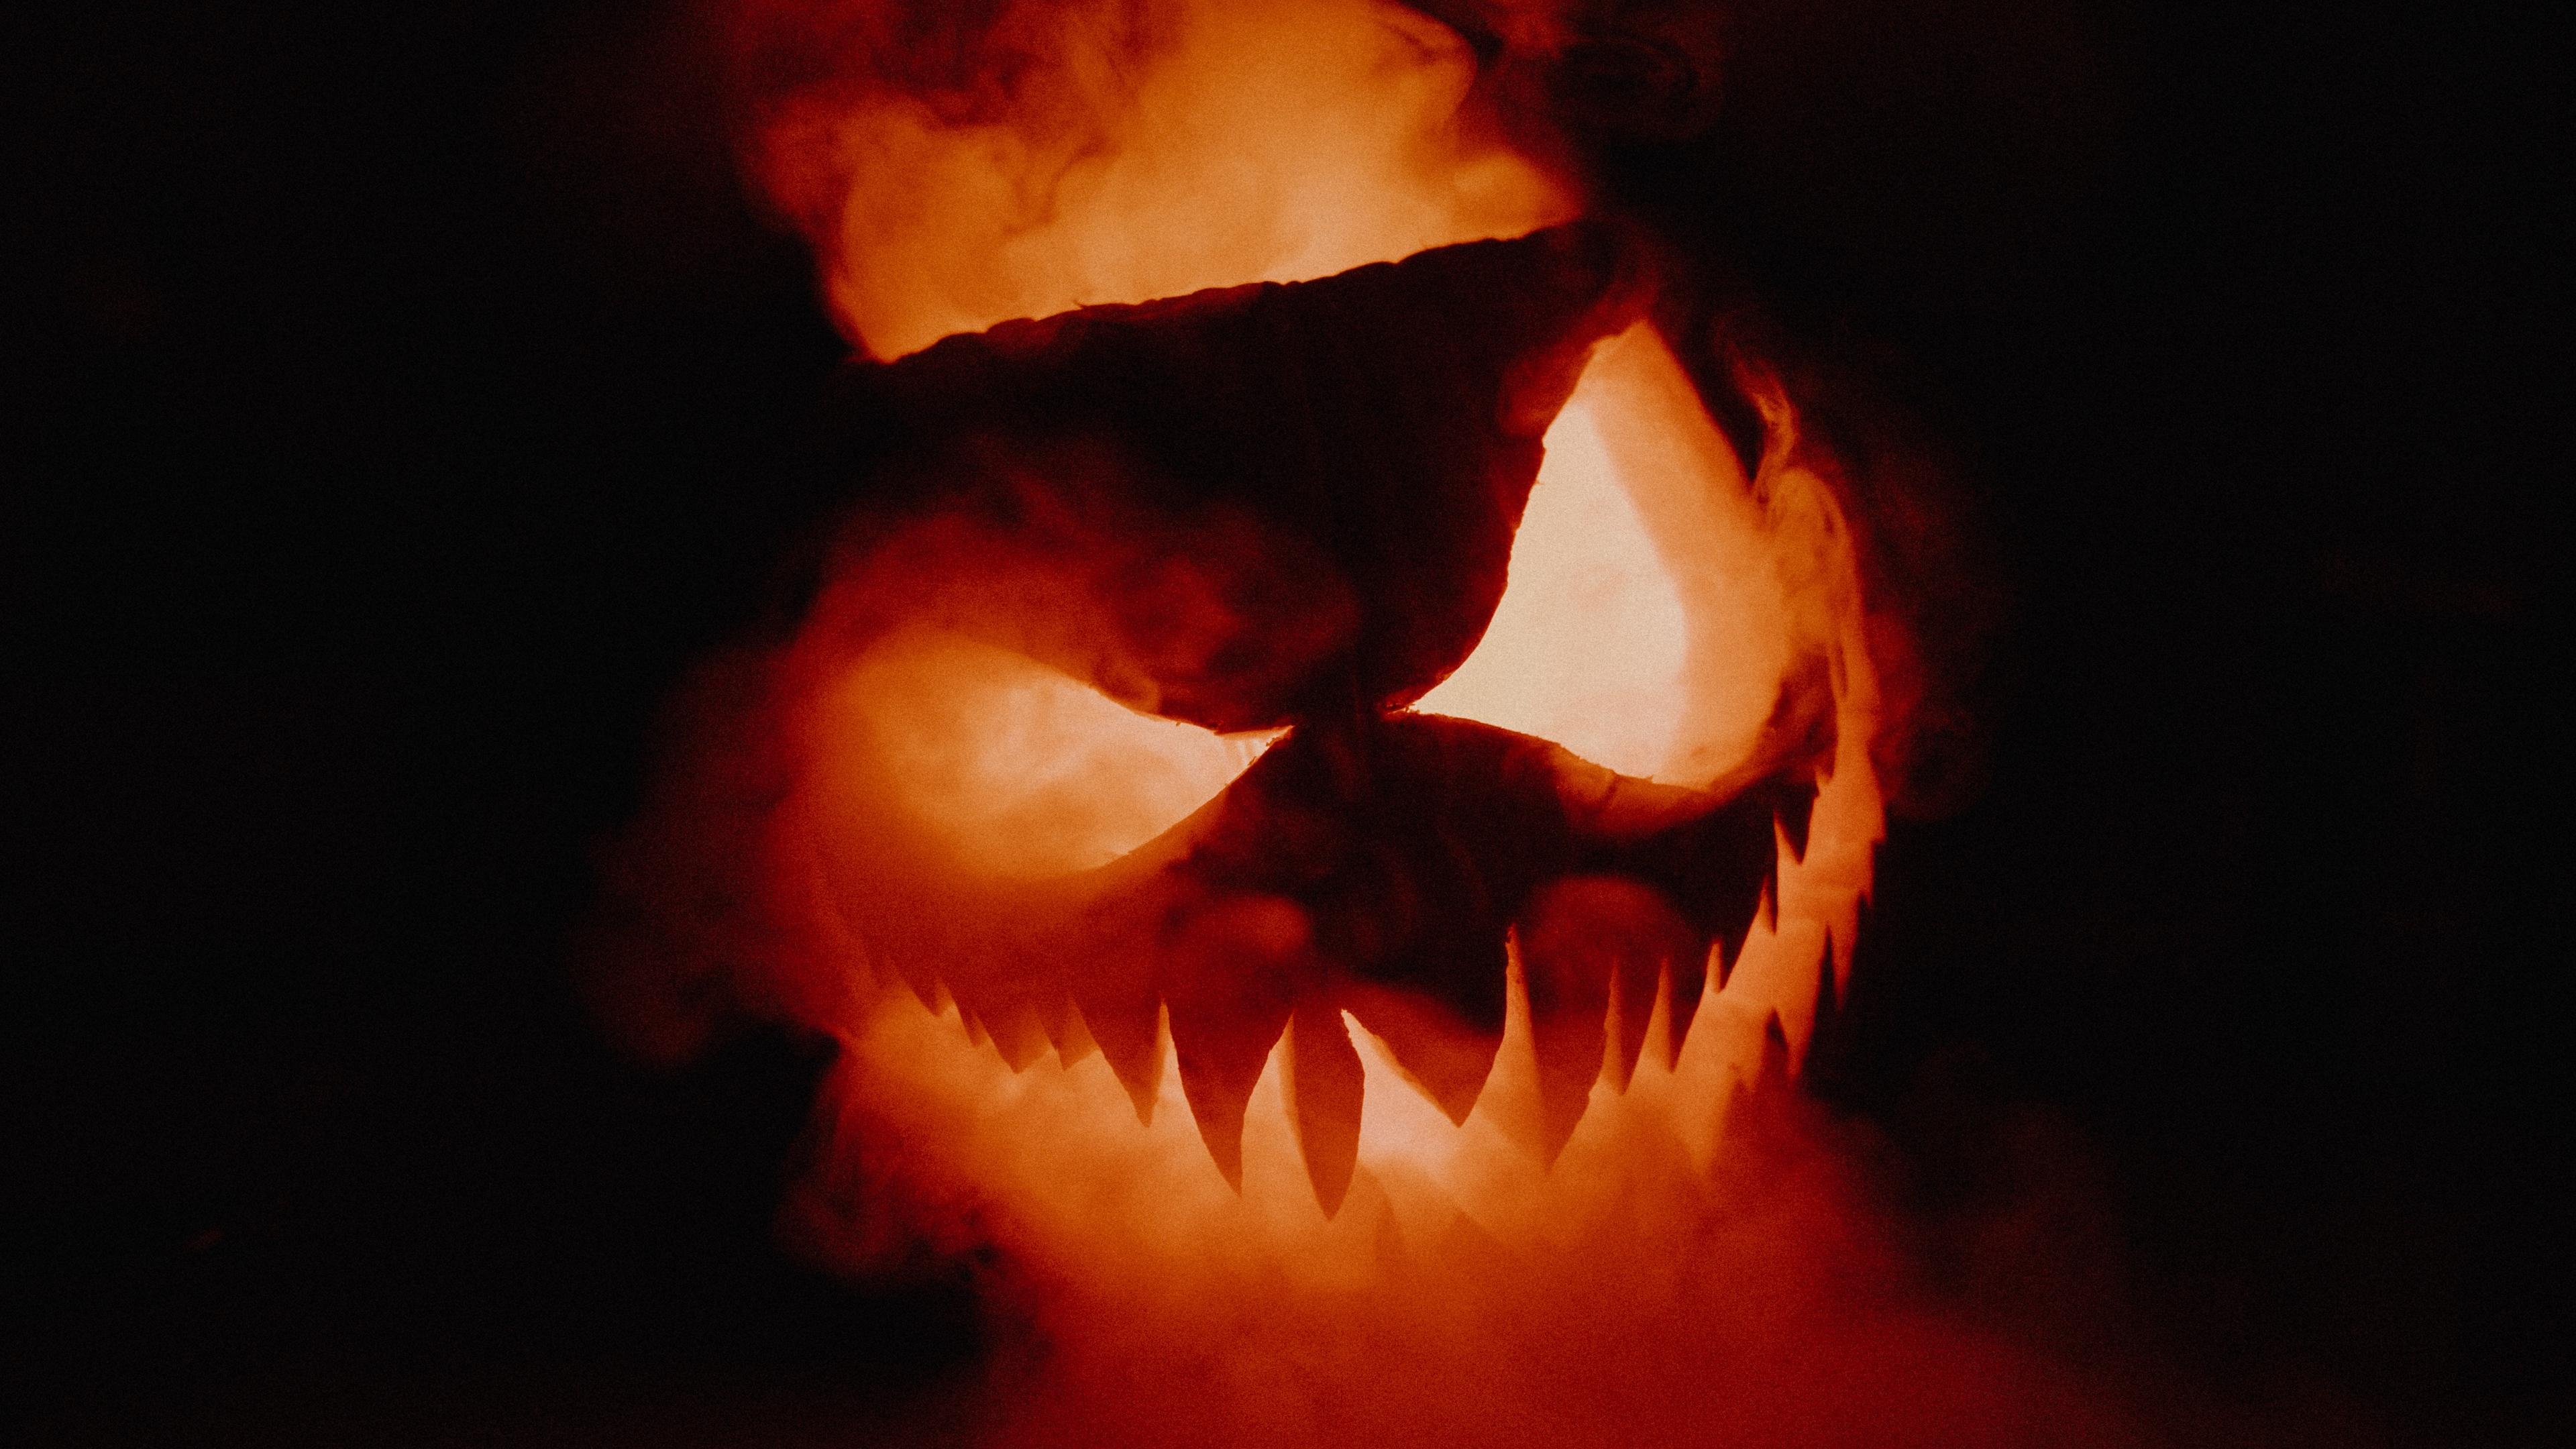 halloween pumpkin smoke 4k 1538344619 - halloween, pumpkin, smoke 4k - Smoke, pumpkin, halloween